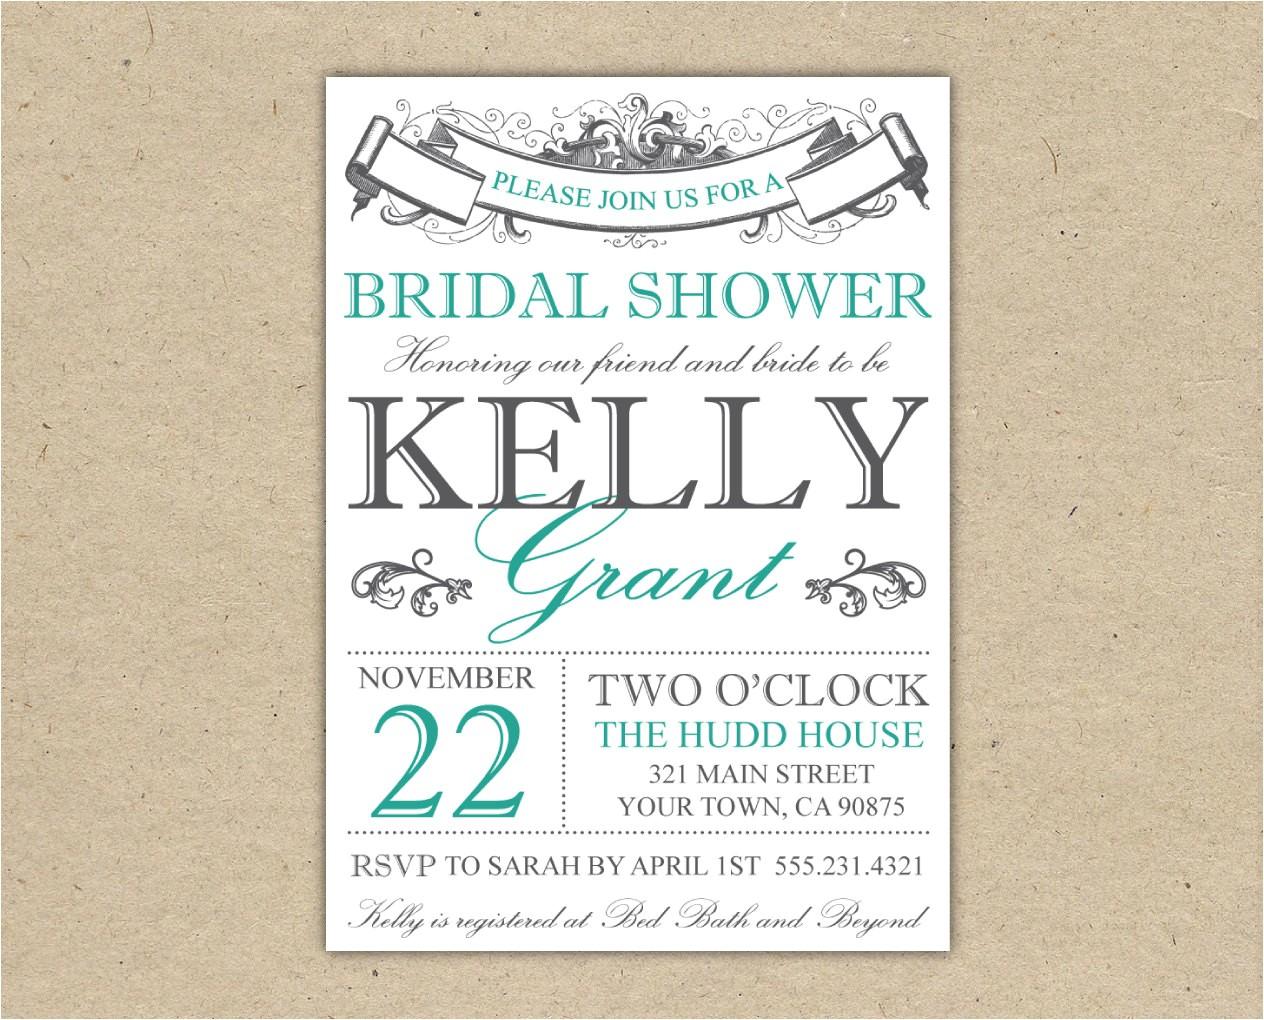 Free Bridal Shower Invitation Printables Bridal Shower Invitations Bridal Shower Invitations Free